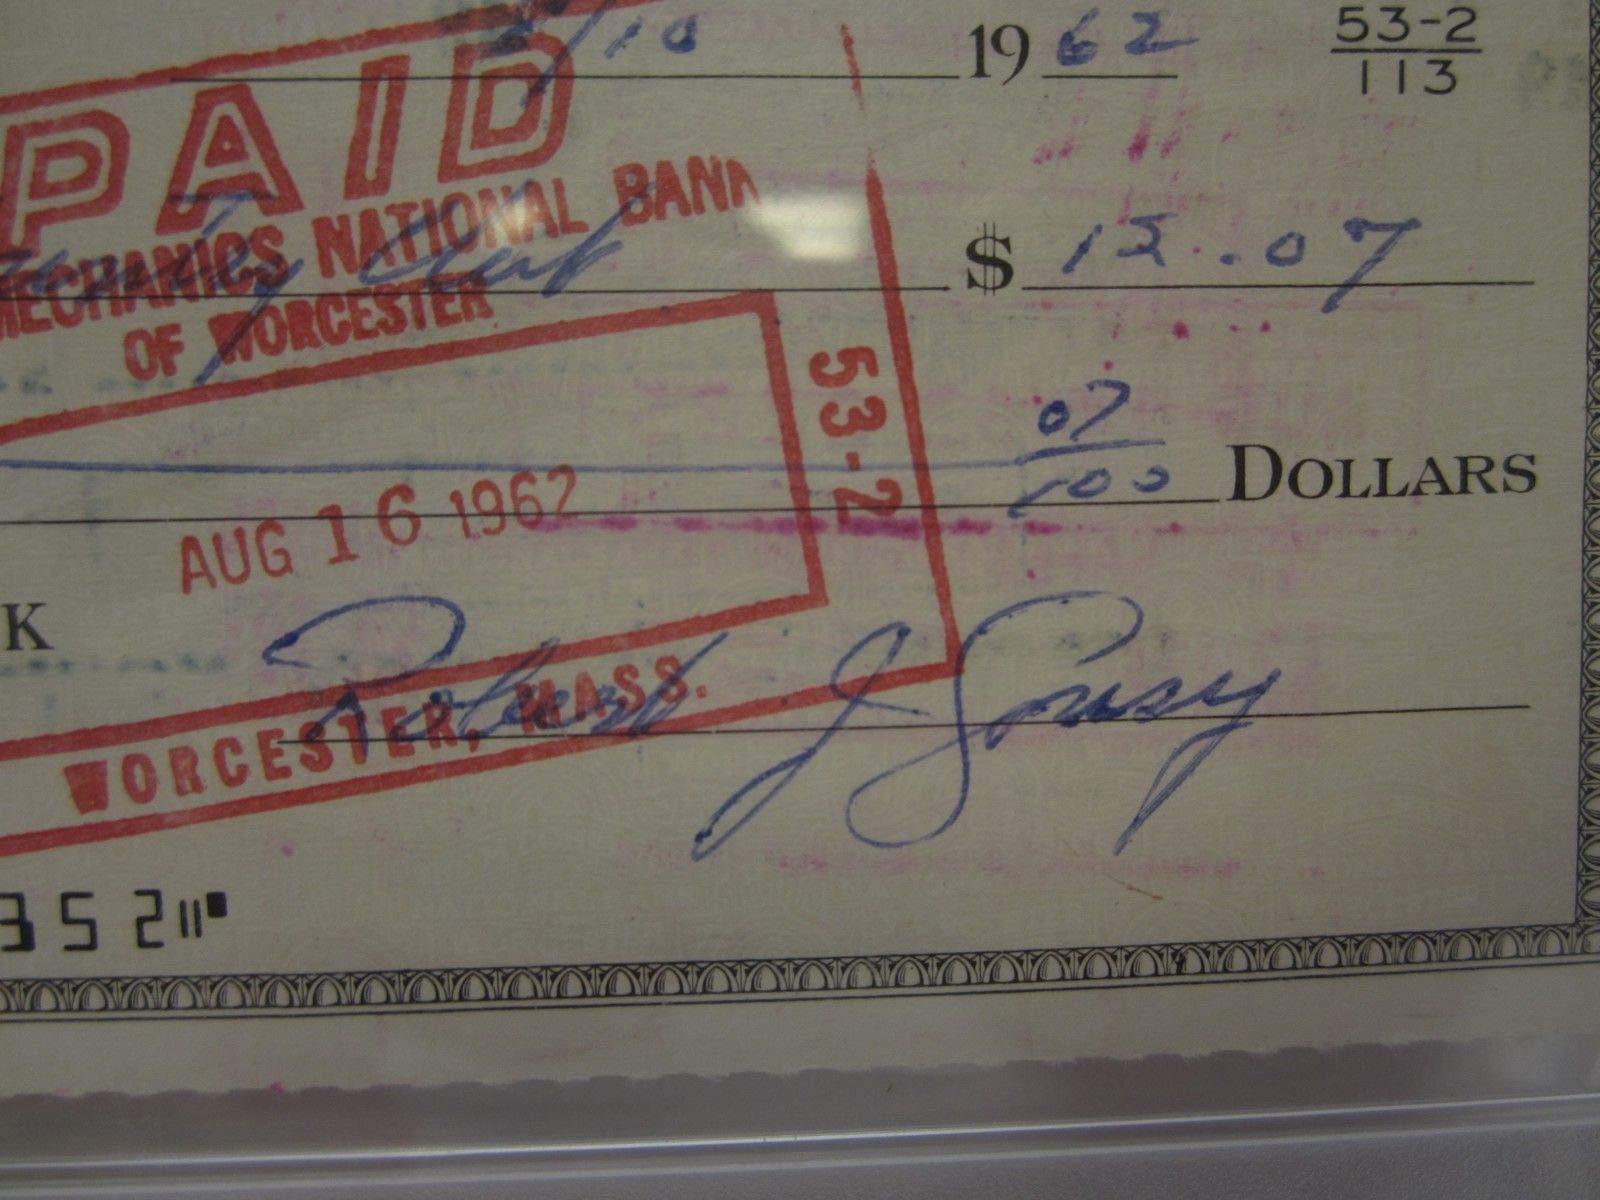 Bob Cousy Boston Celtics Autographed Signed Canceled Check 1962 Authetnic Autograph PSA/DNA